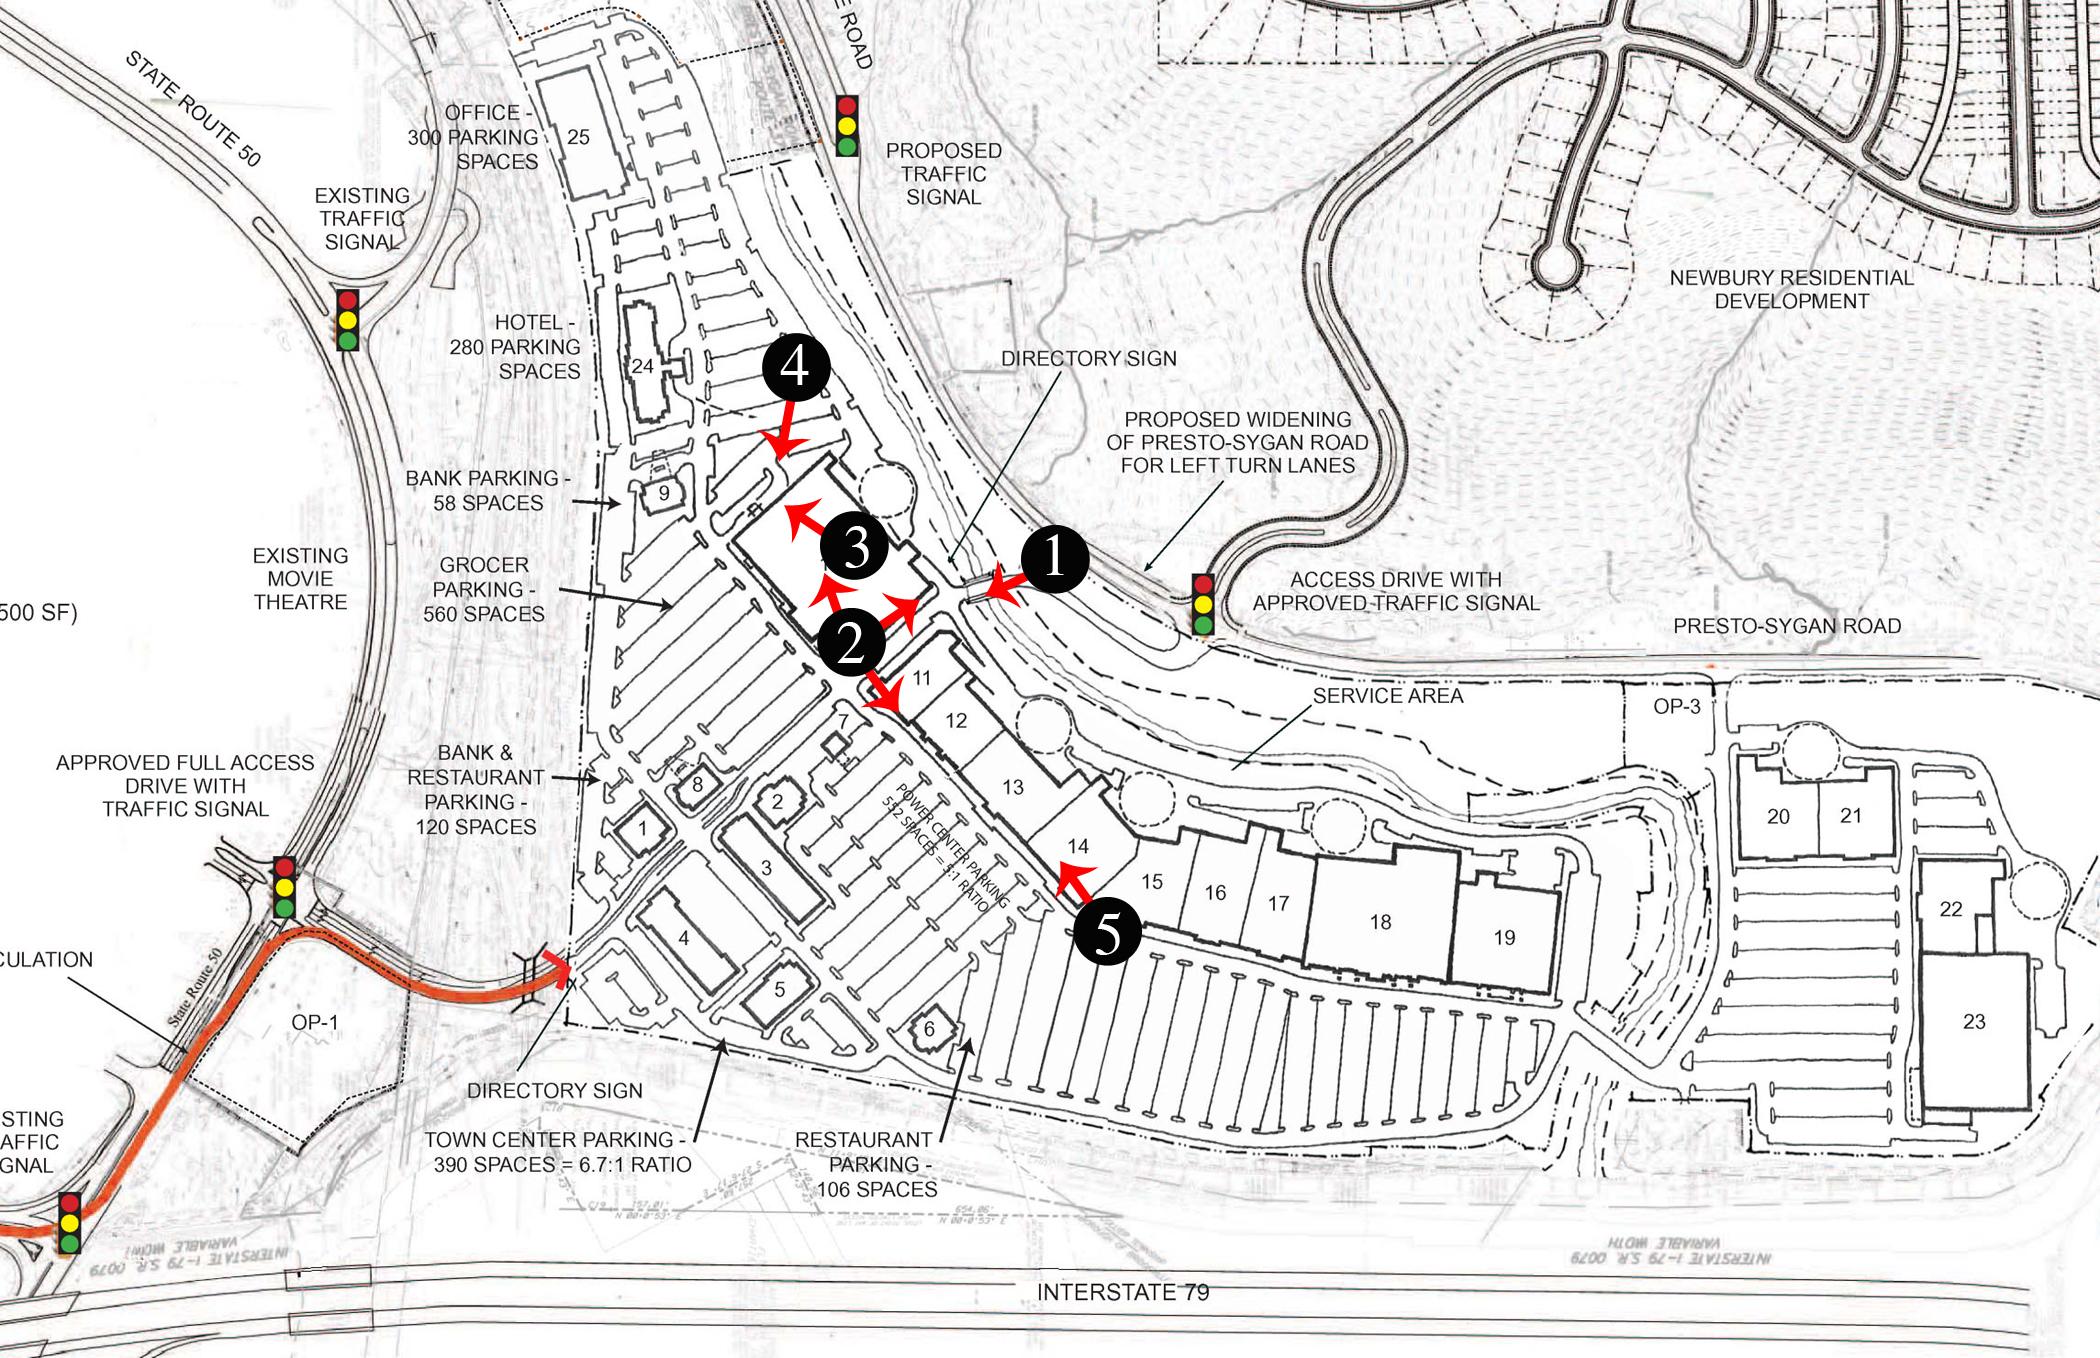 12-14 Retail Site Plan